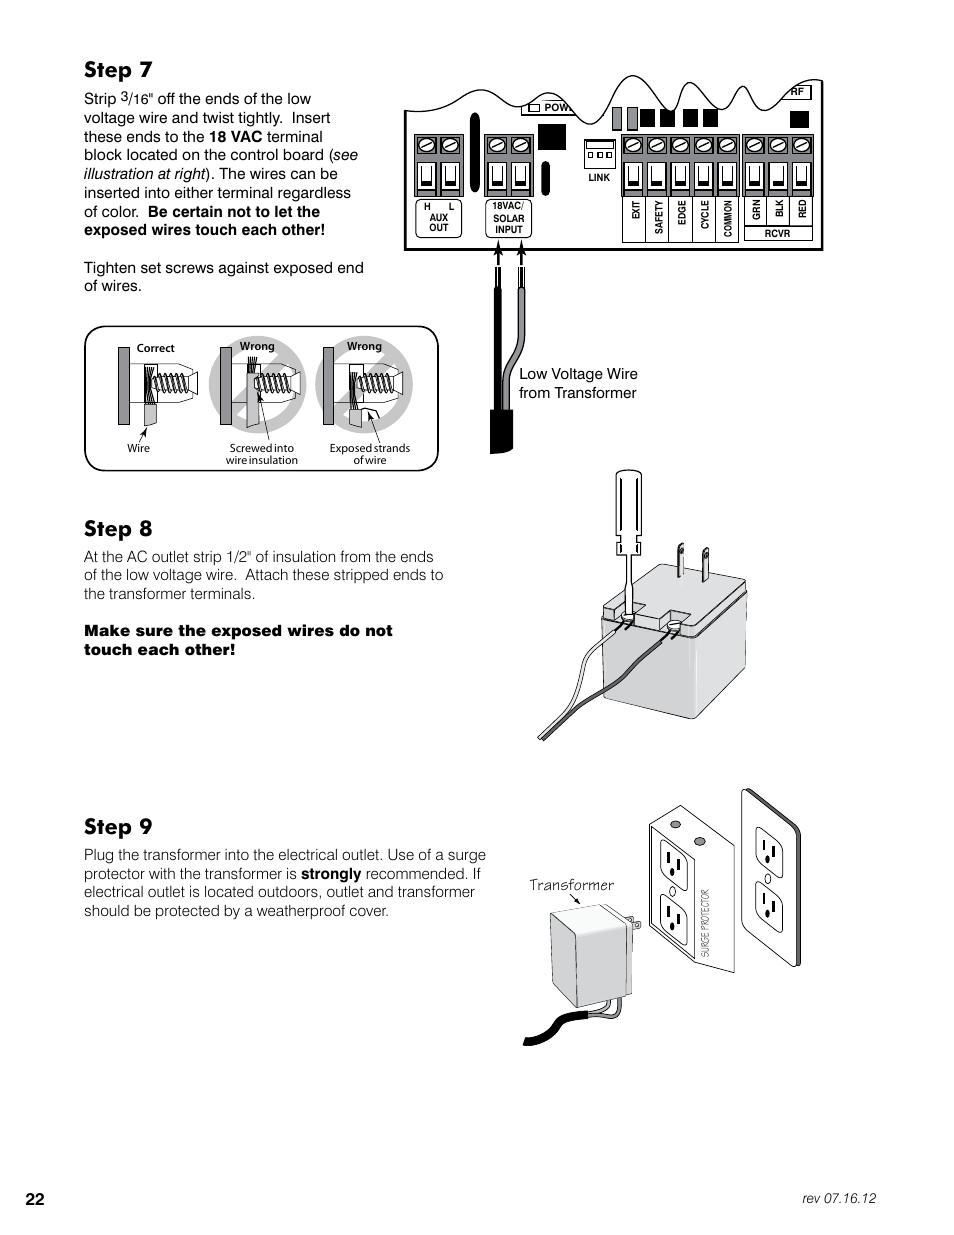 fm 350 wiring diagram 350 engine diagram 350 starter diagram 350 rh banyan palace com 327 Chevy Distributor Wiring Diagram 1986 C20 350 Engine Wire Diagrams